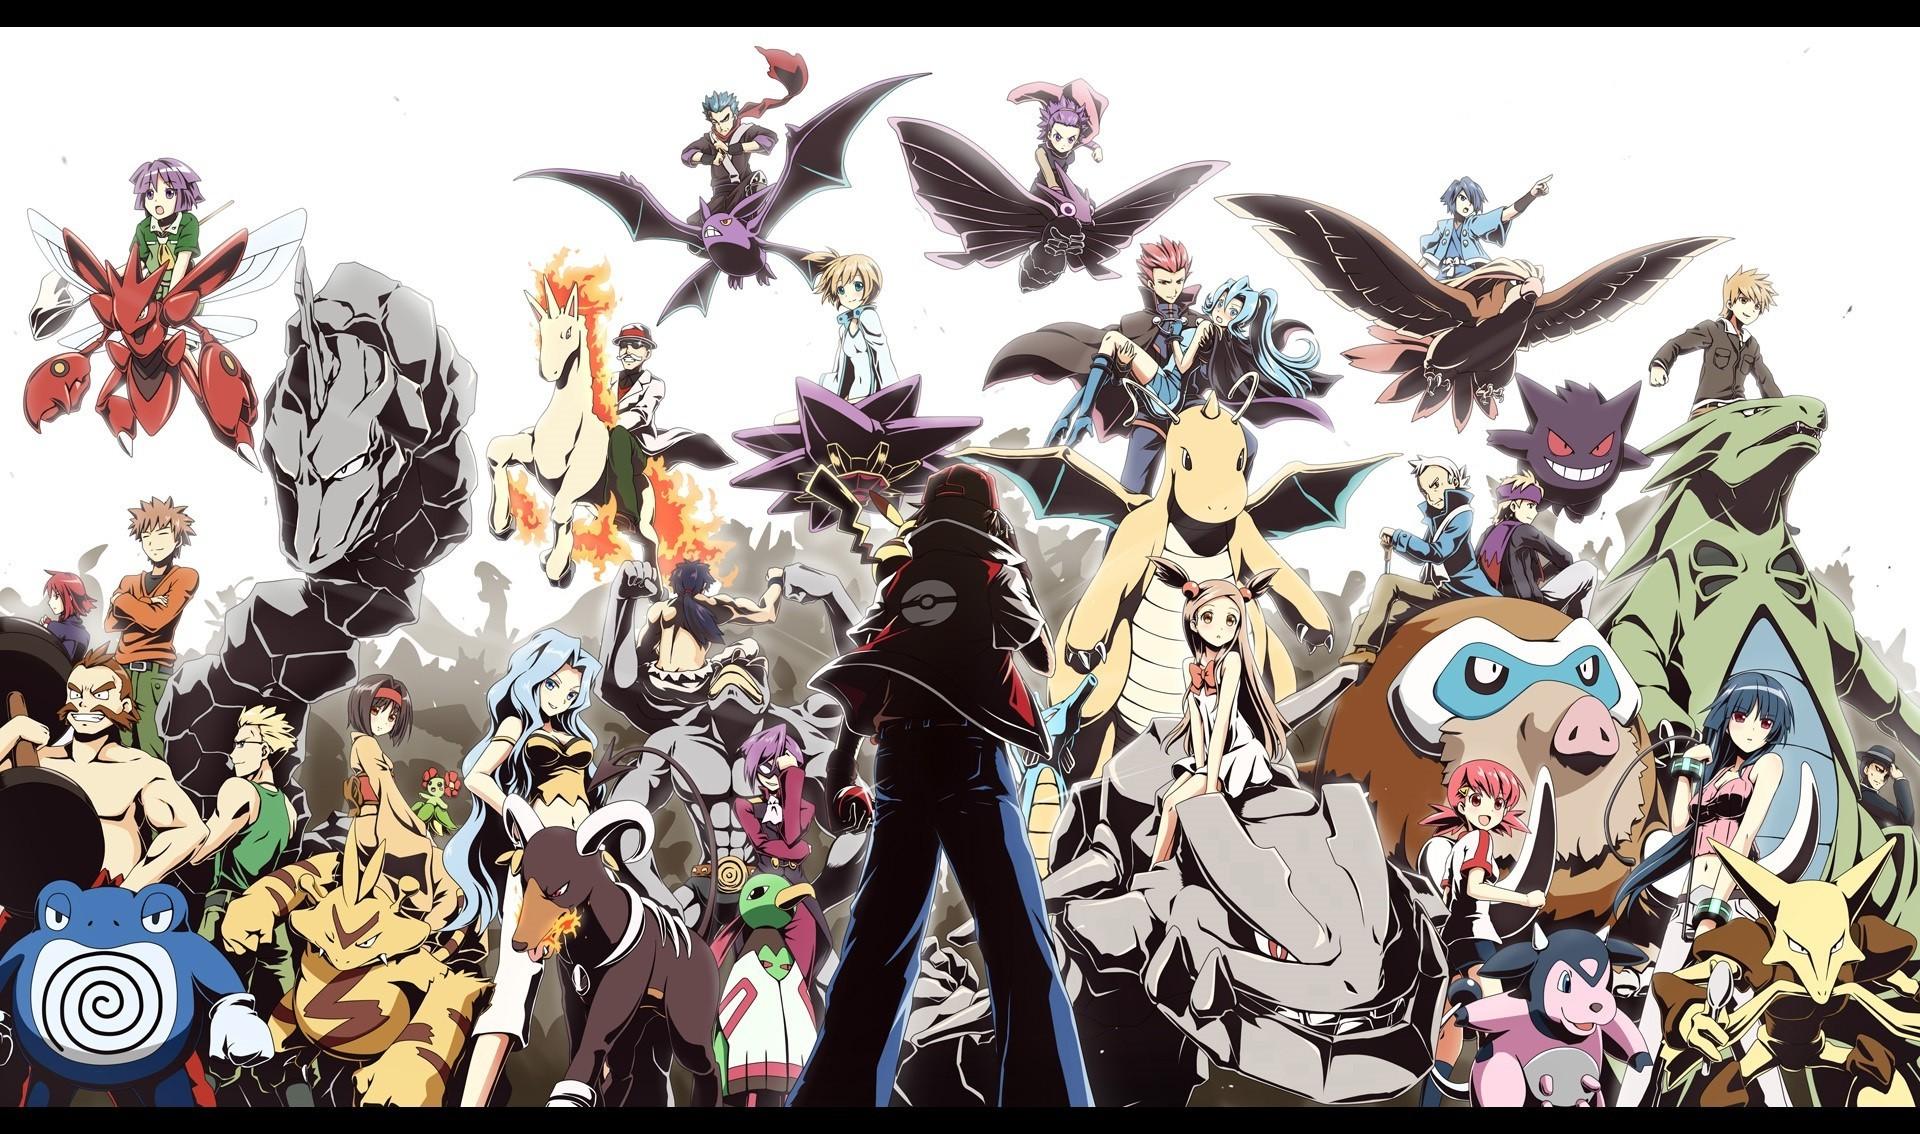 artwork, Fantasy Art, Anime, Warrior, Dragon, Futuristic, Sword Wallpaper HD